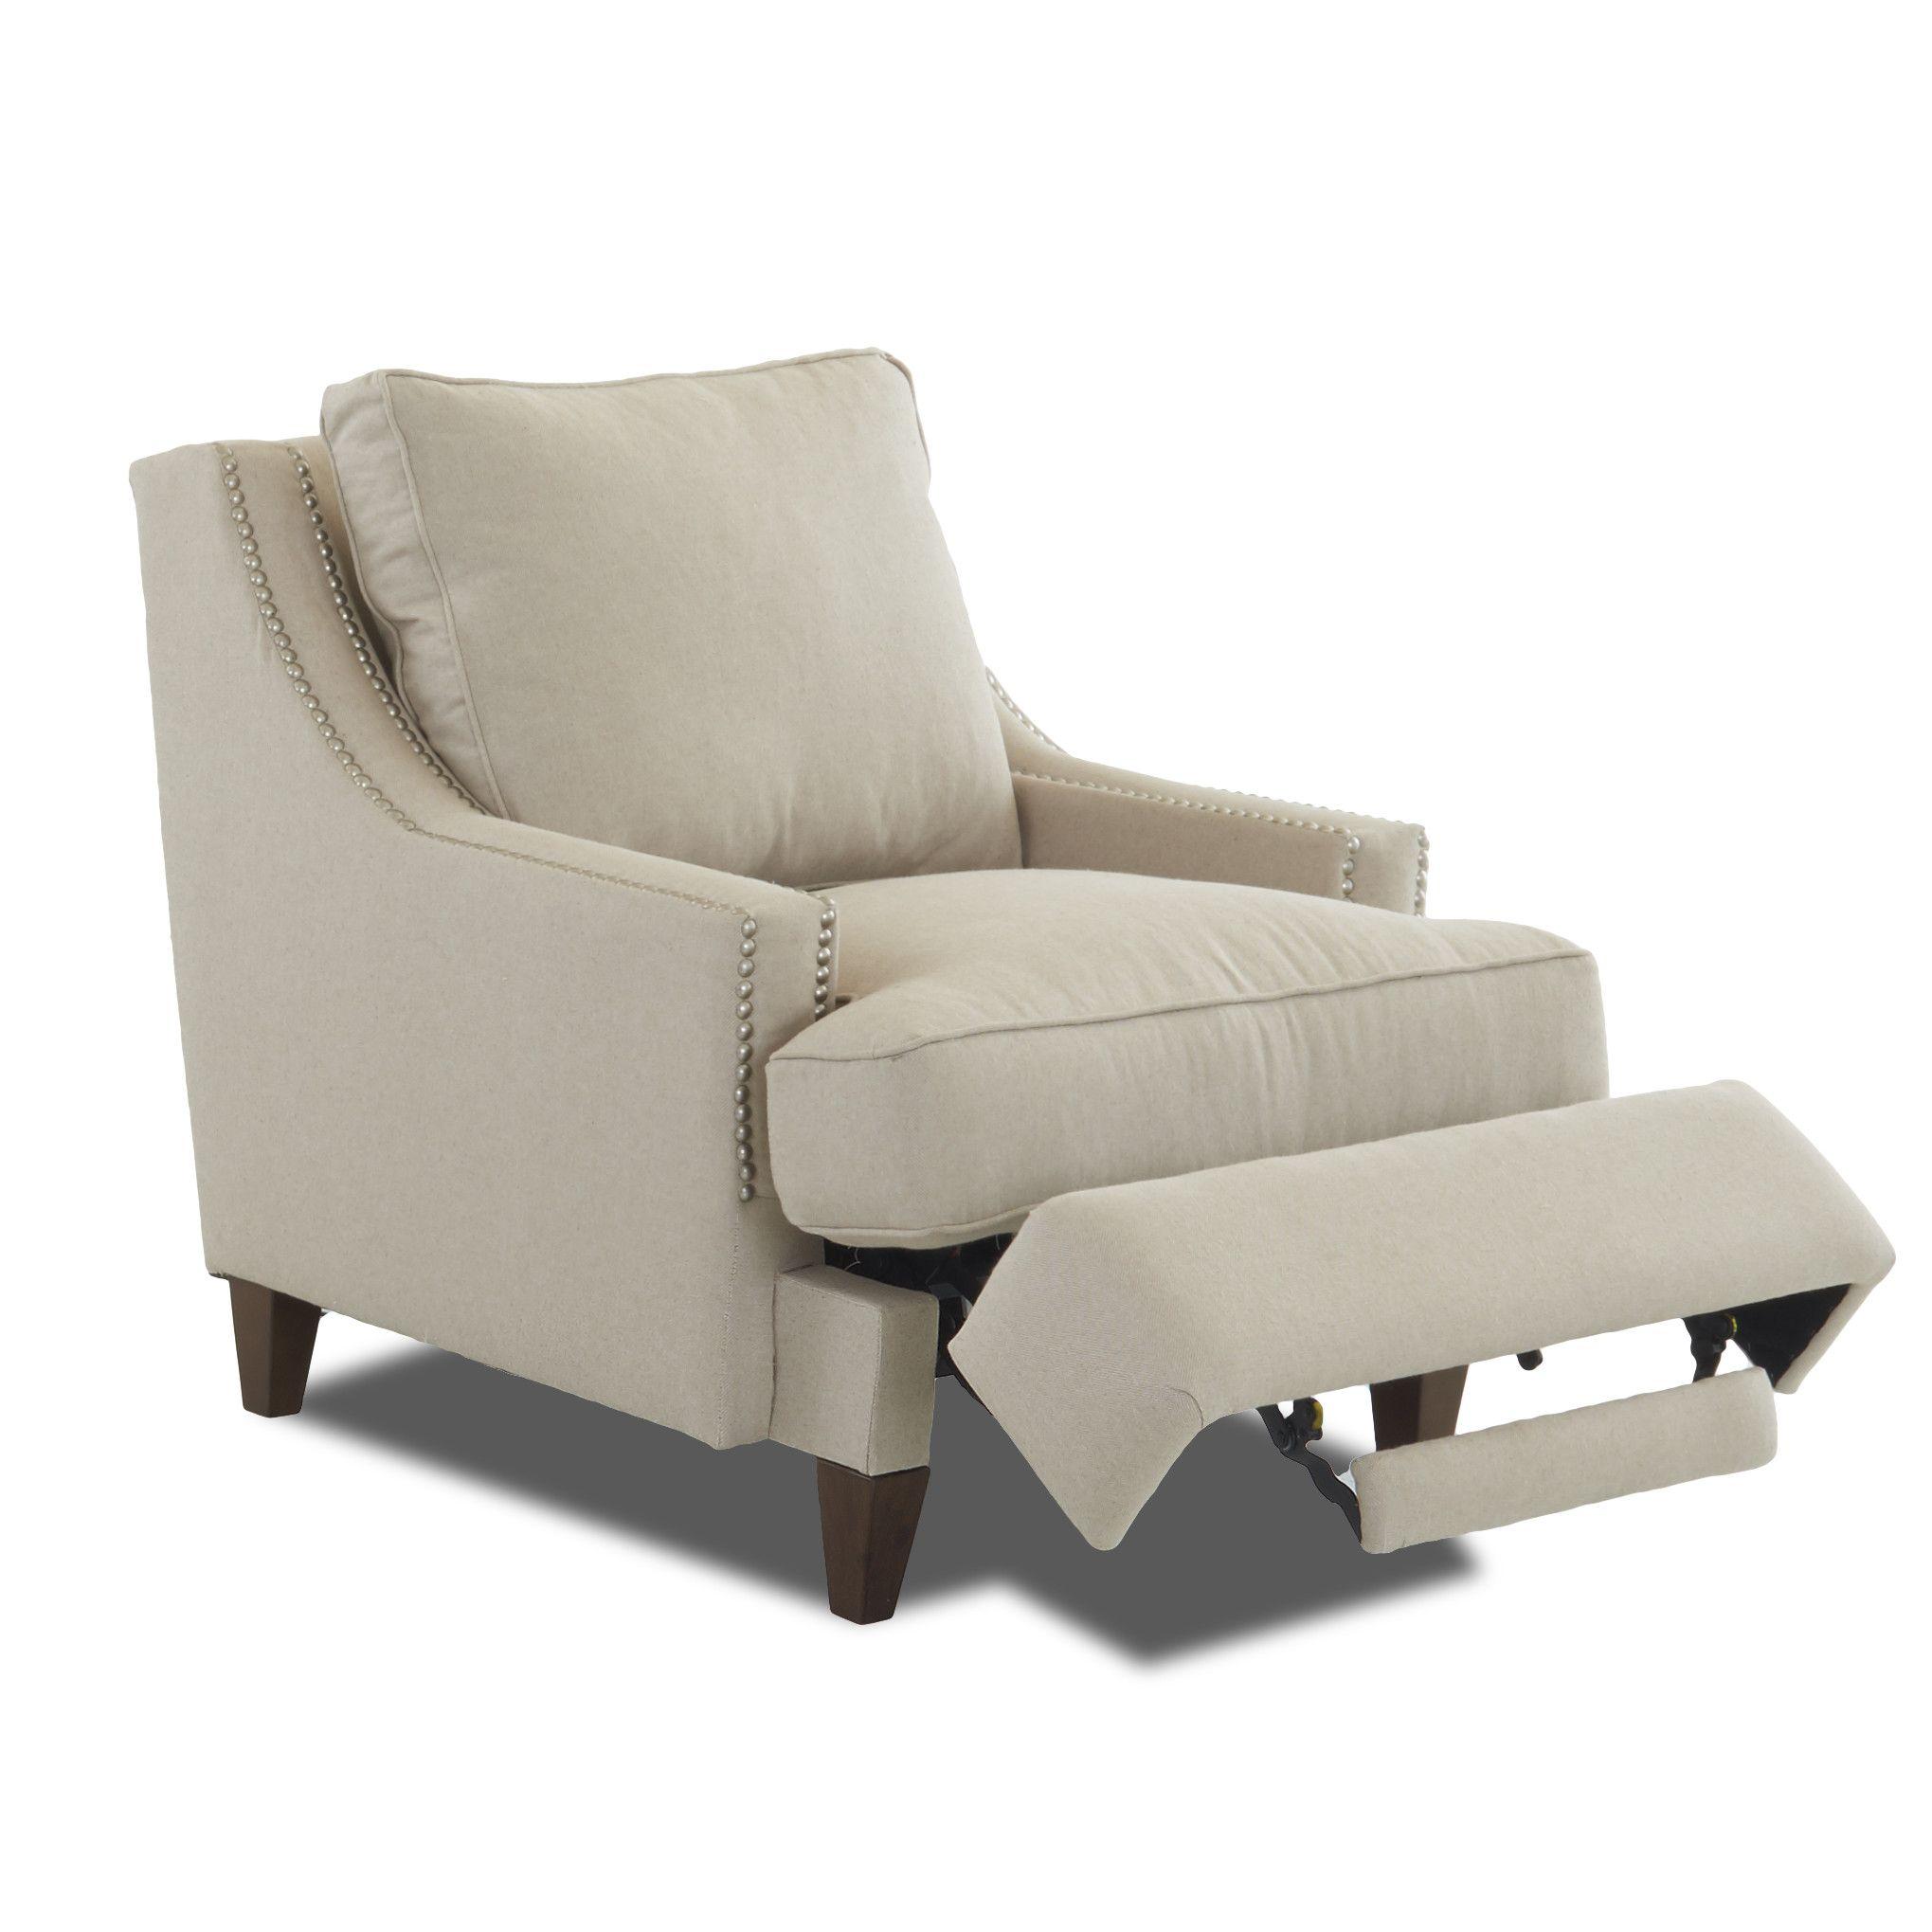 4 person reclining sofa fabric sets uk wayfair custom upholstery tricia power hybrid